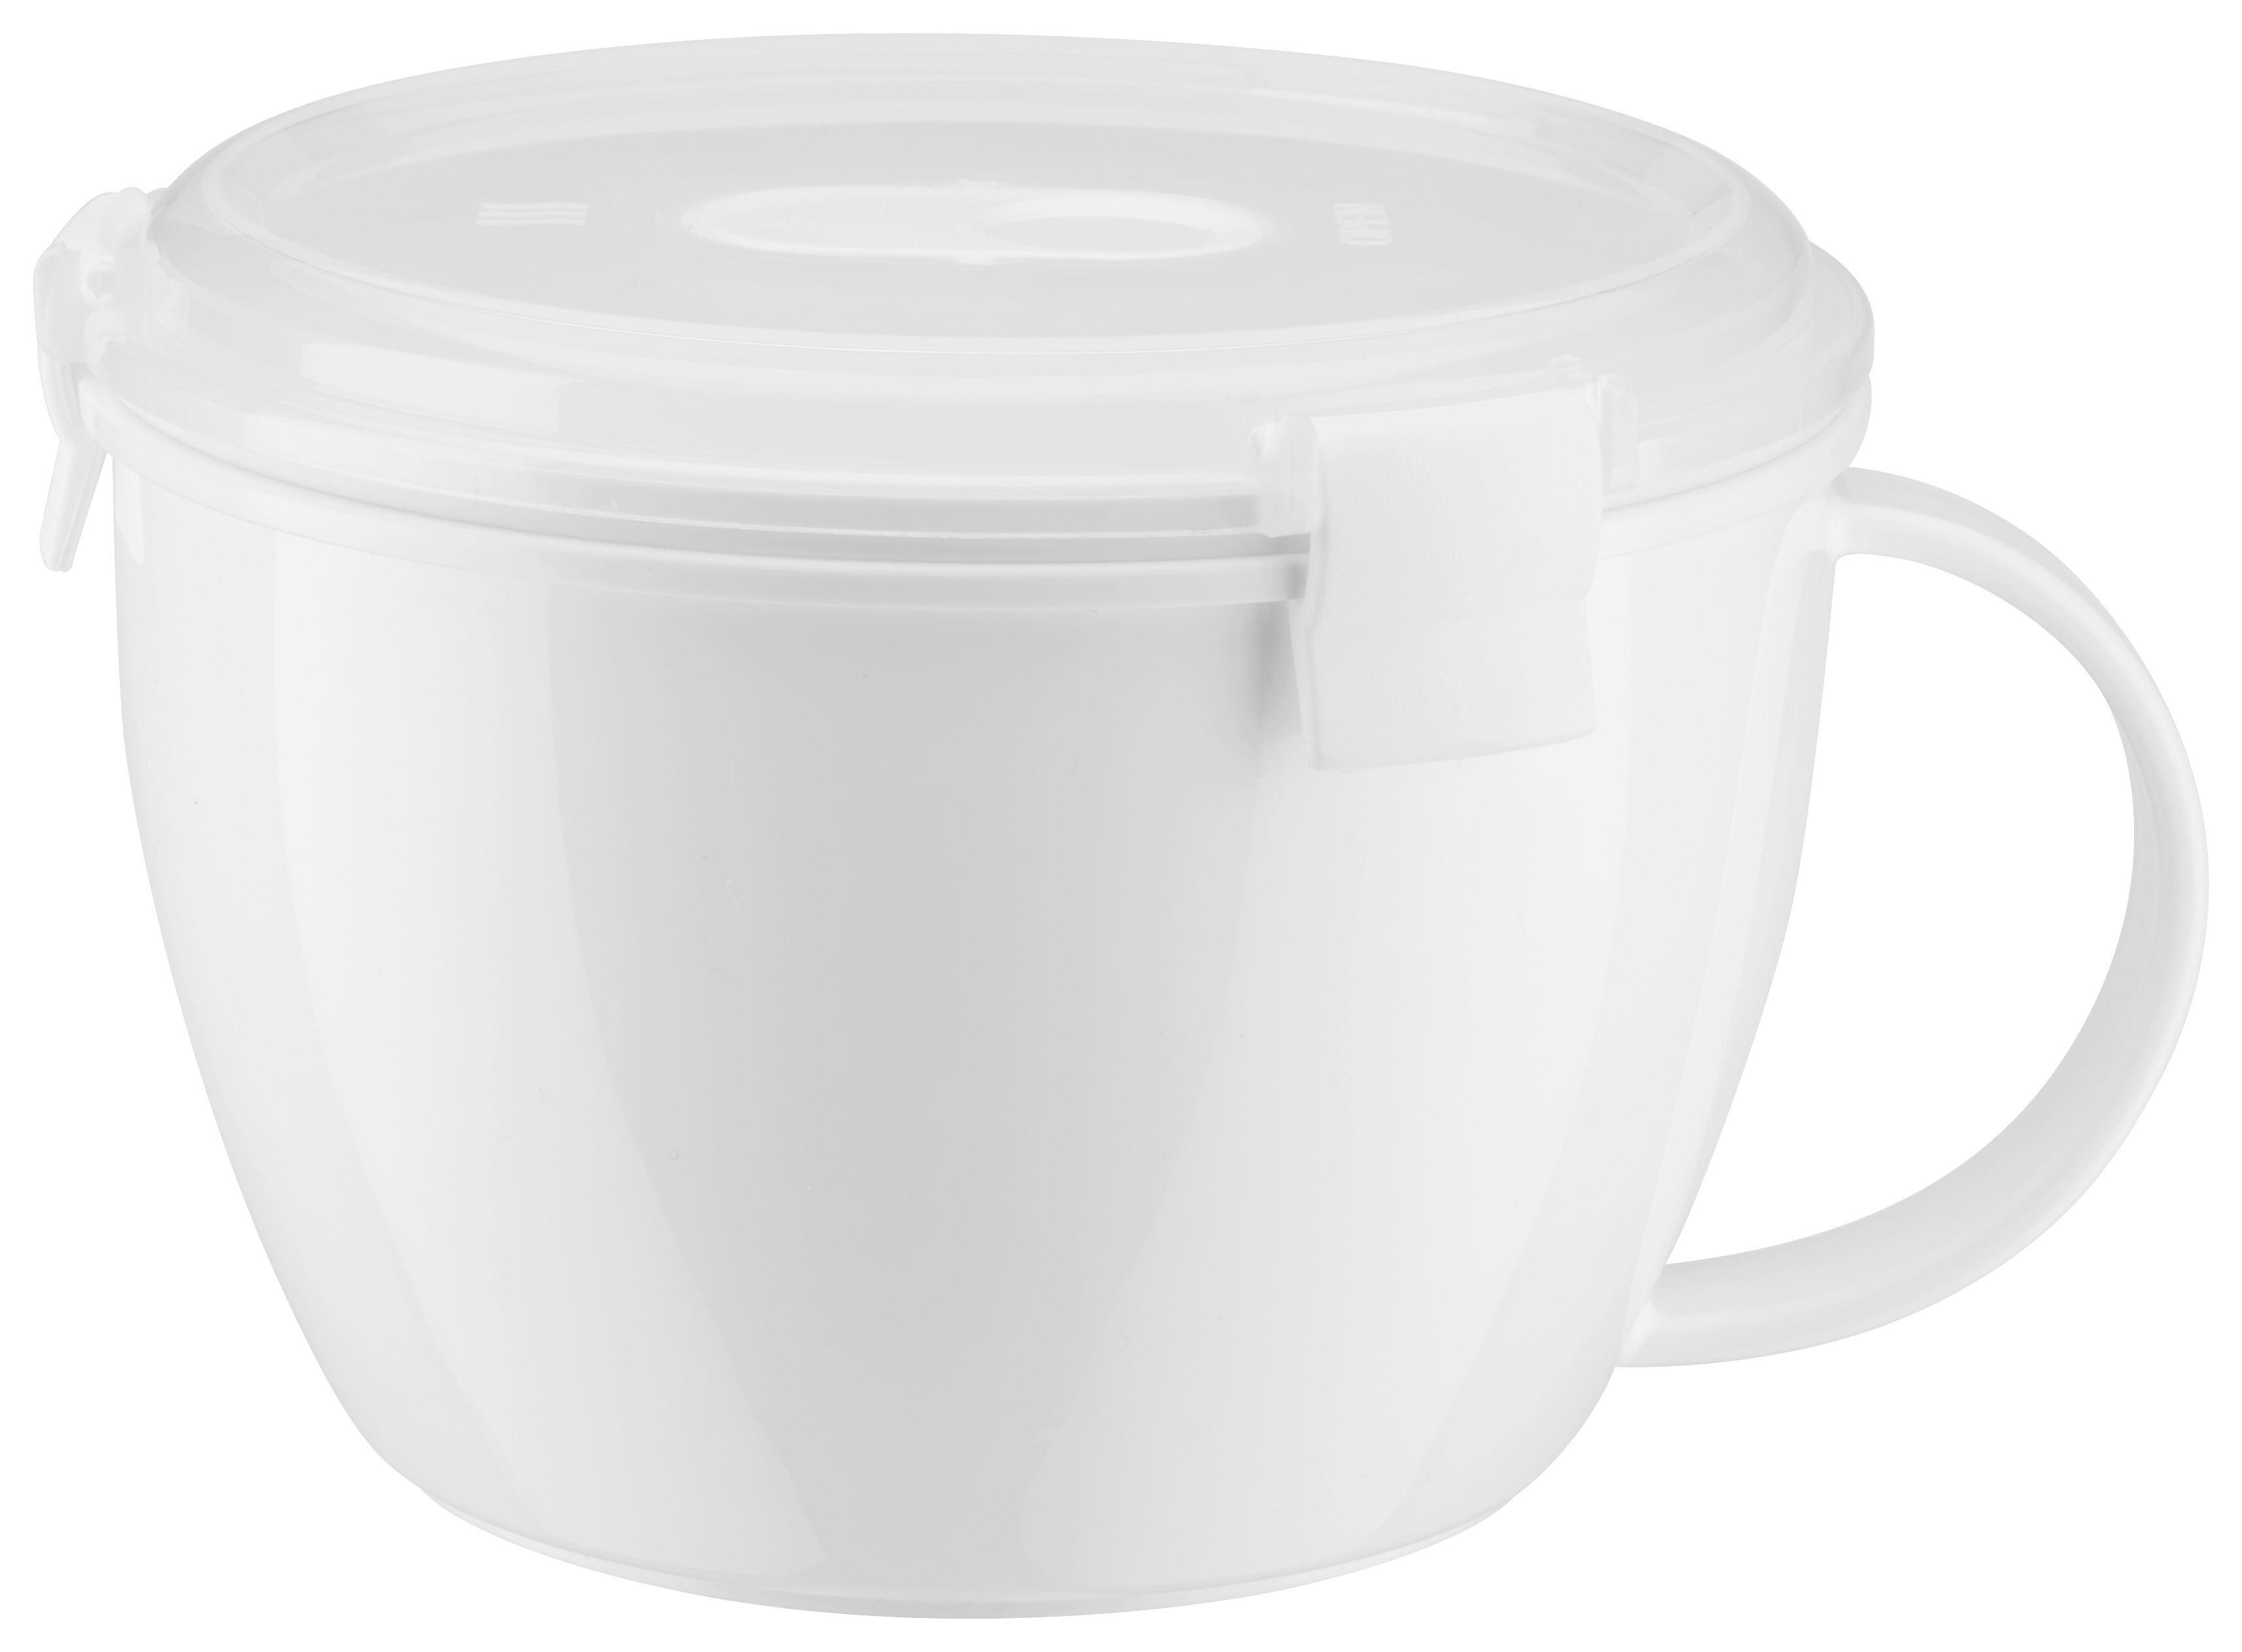 Mikrowellendose Mikka in Weiß, ca. 940ml - Transparent/Weiß, Kunststoff (0,94l) - MÖMAX modern living